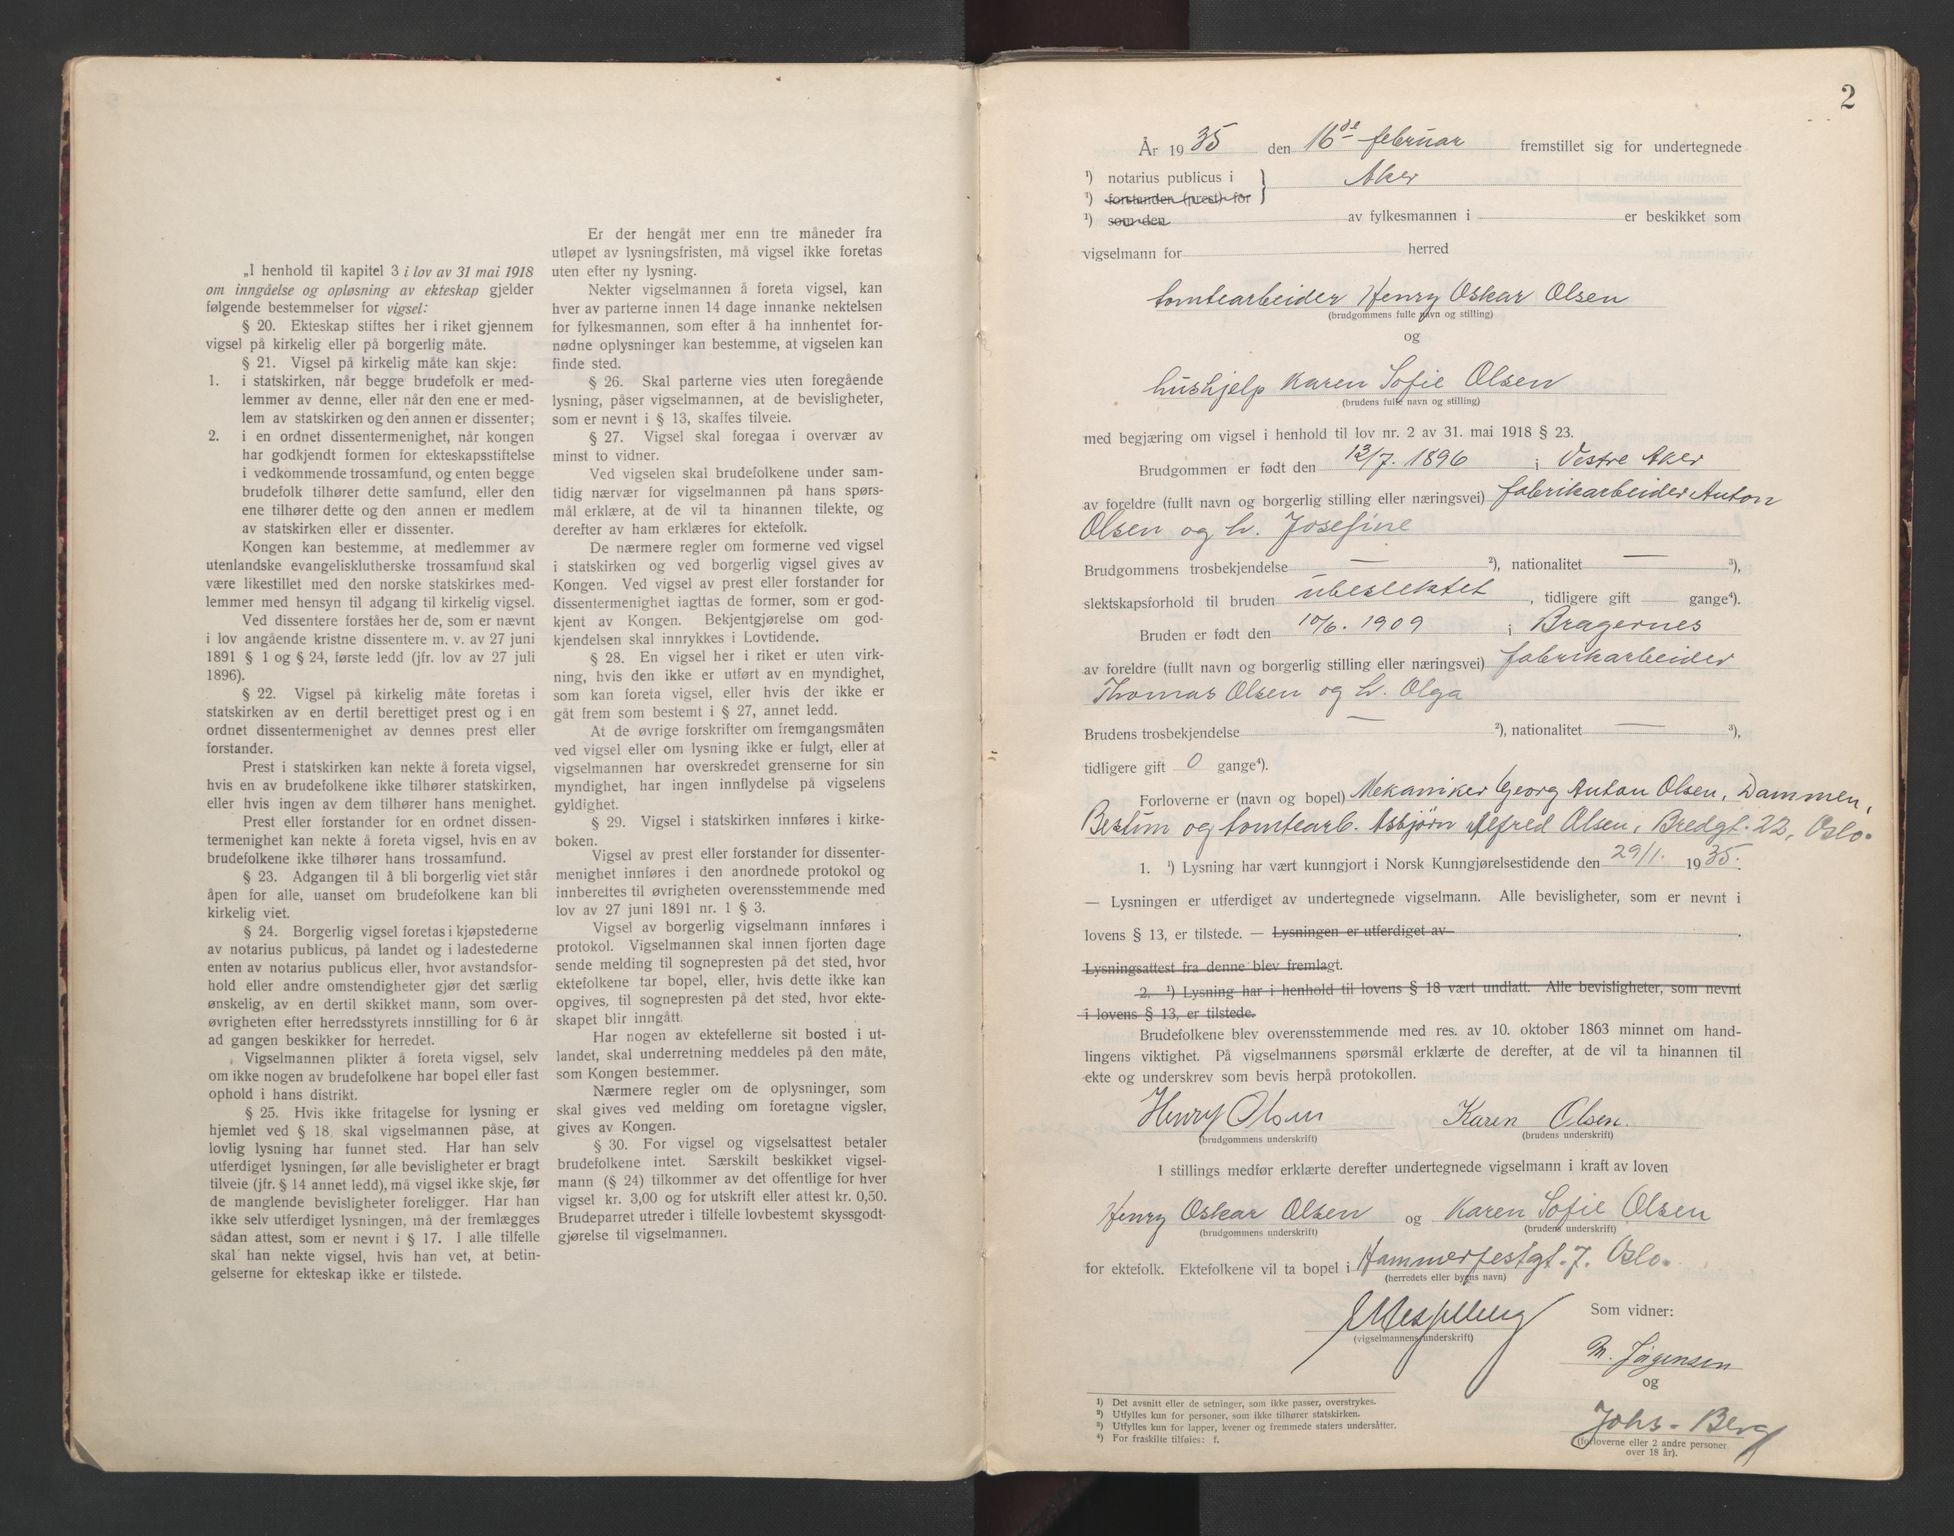 SAO, Aker sorenskriveri, L/Lc/Lcb/L0008: Vigselprotokoll, 1935-1936, s. 2